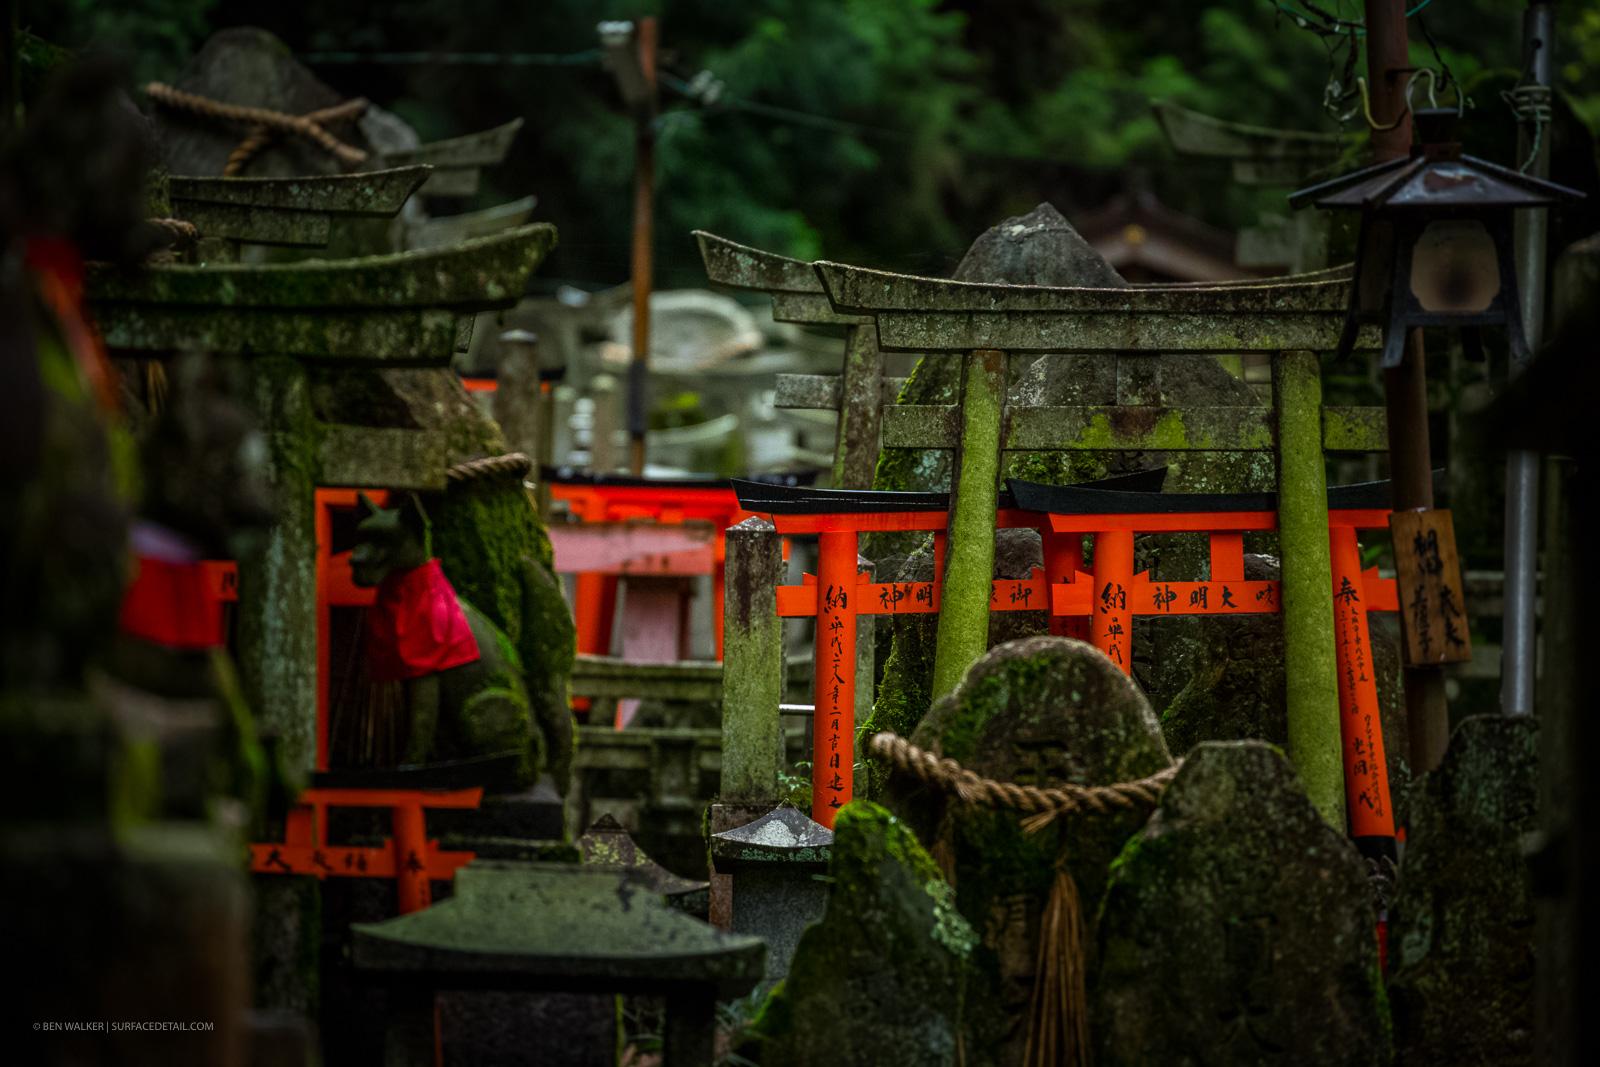 japan_nature_20160511_14.jpg